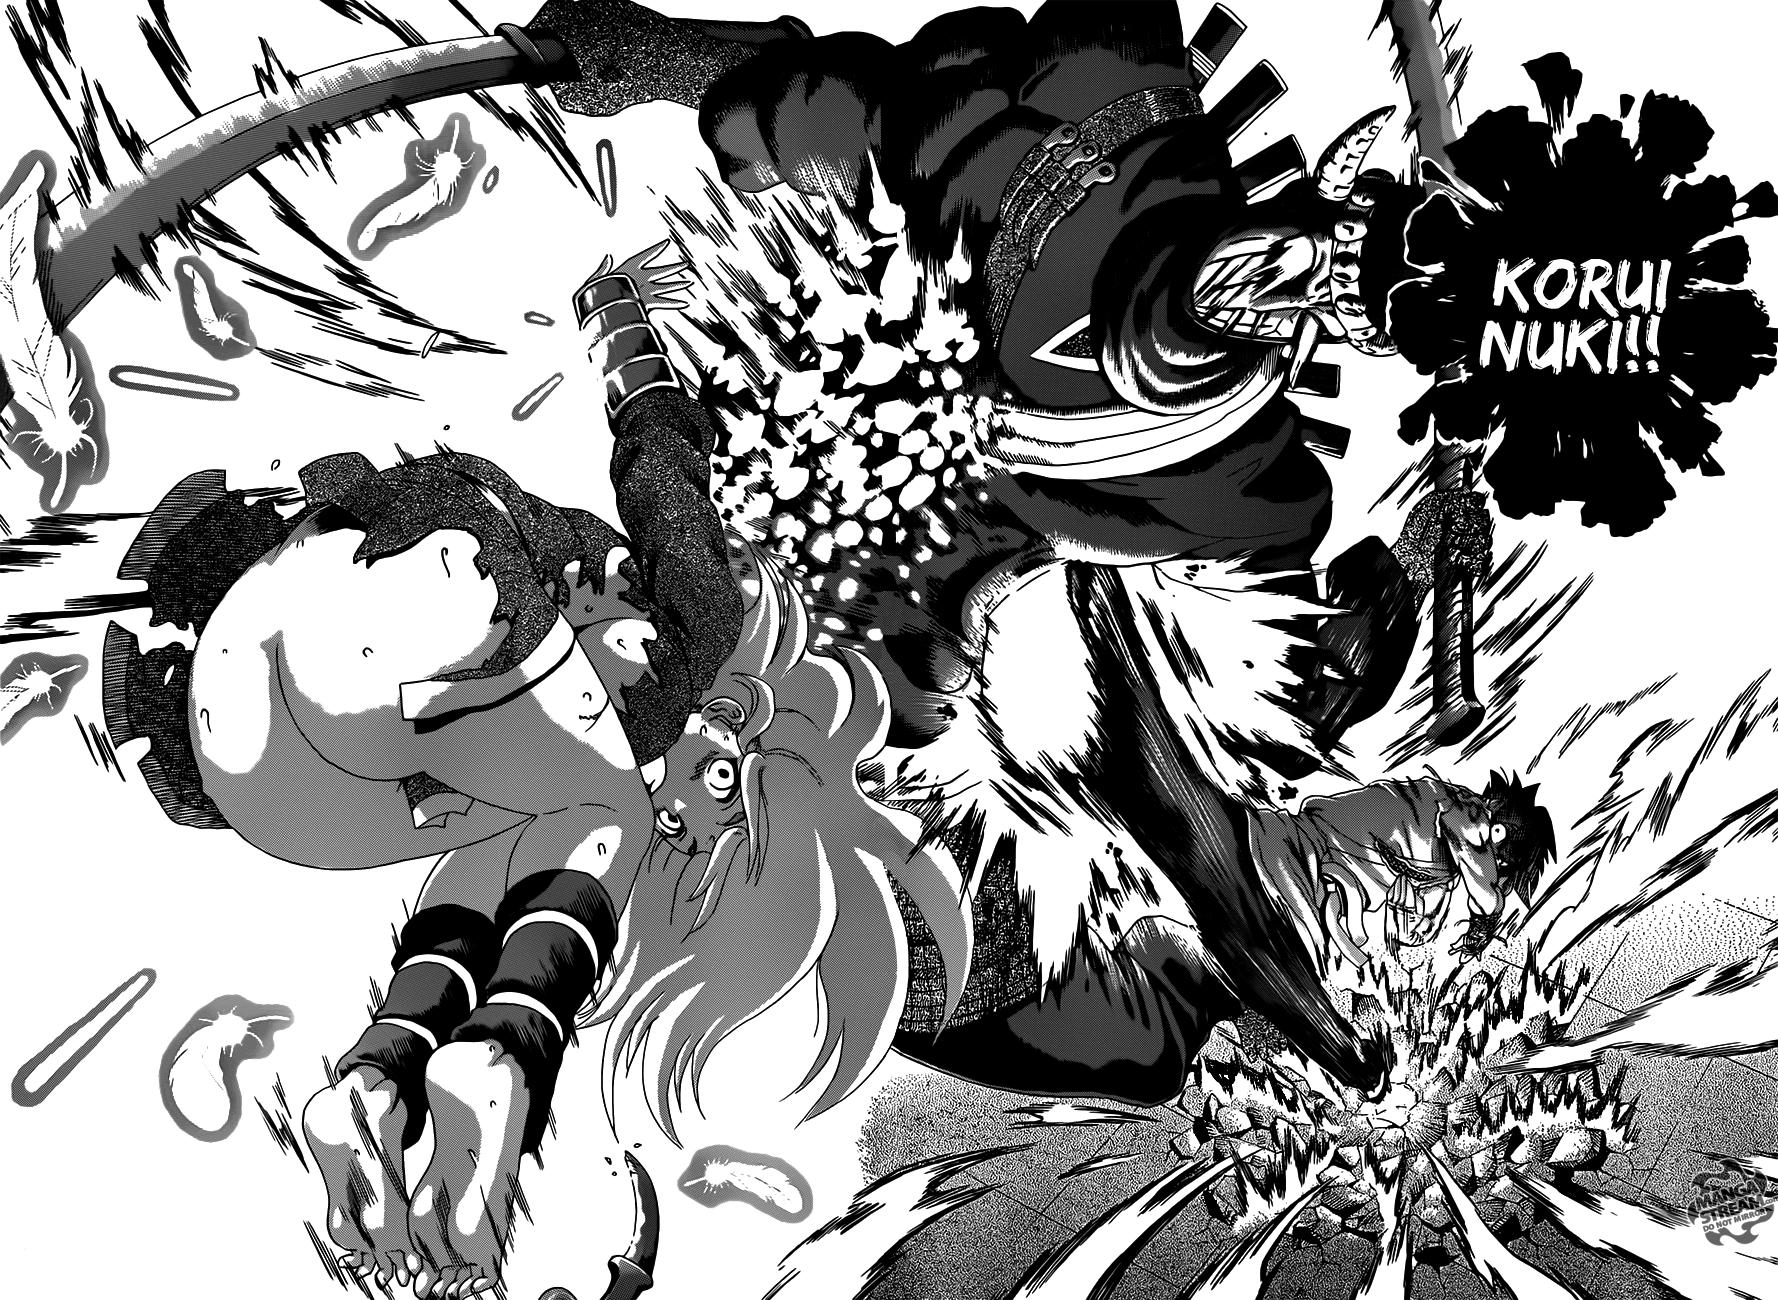 Shijou Saikyou No Deshi Kenichi Wallpaper Hd Posted By Christopher